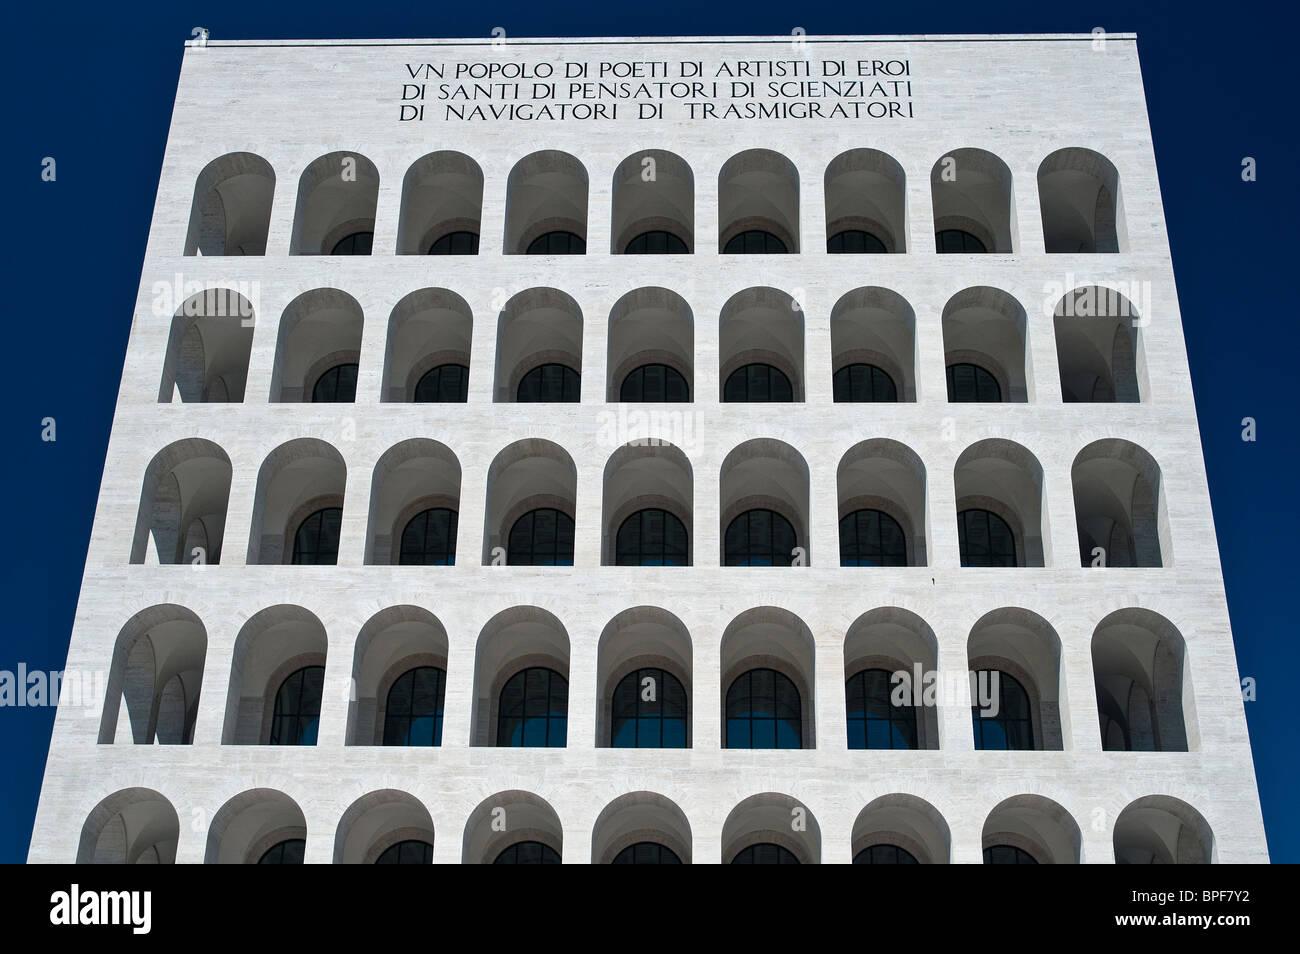 Palazzo della Civiltà Italiana building, icône de l'architecture fasciste, quartier EUR, Rome, Italie Banque D'Images